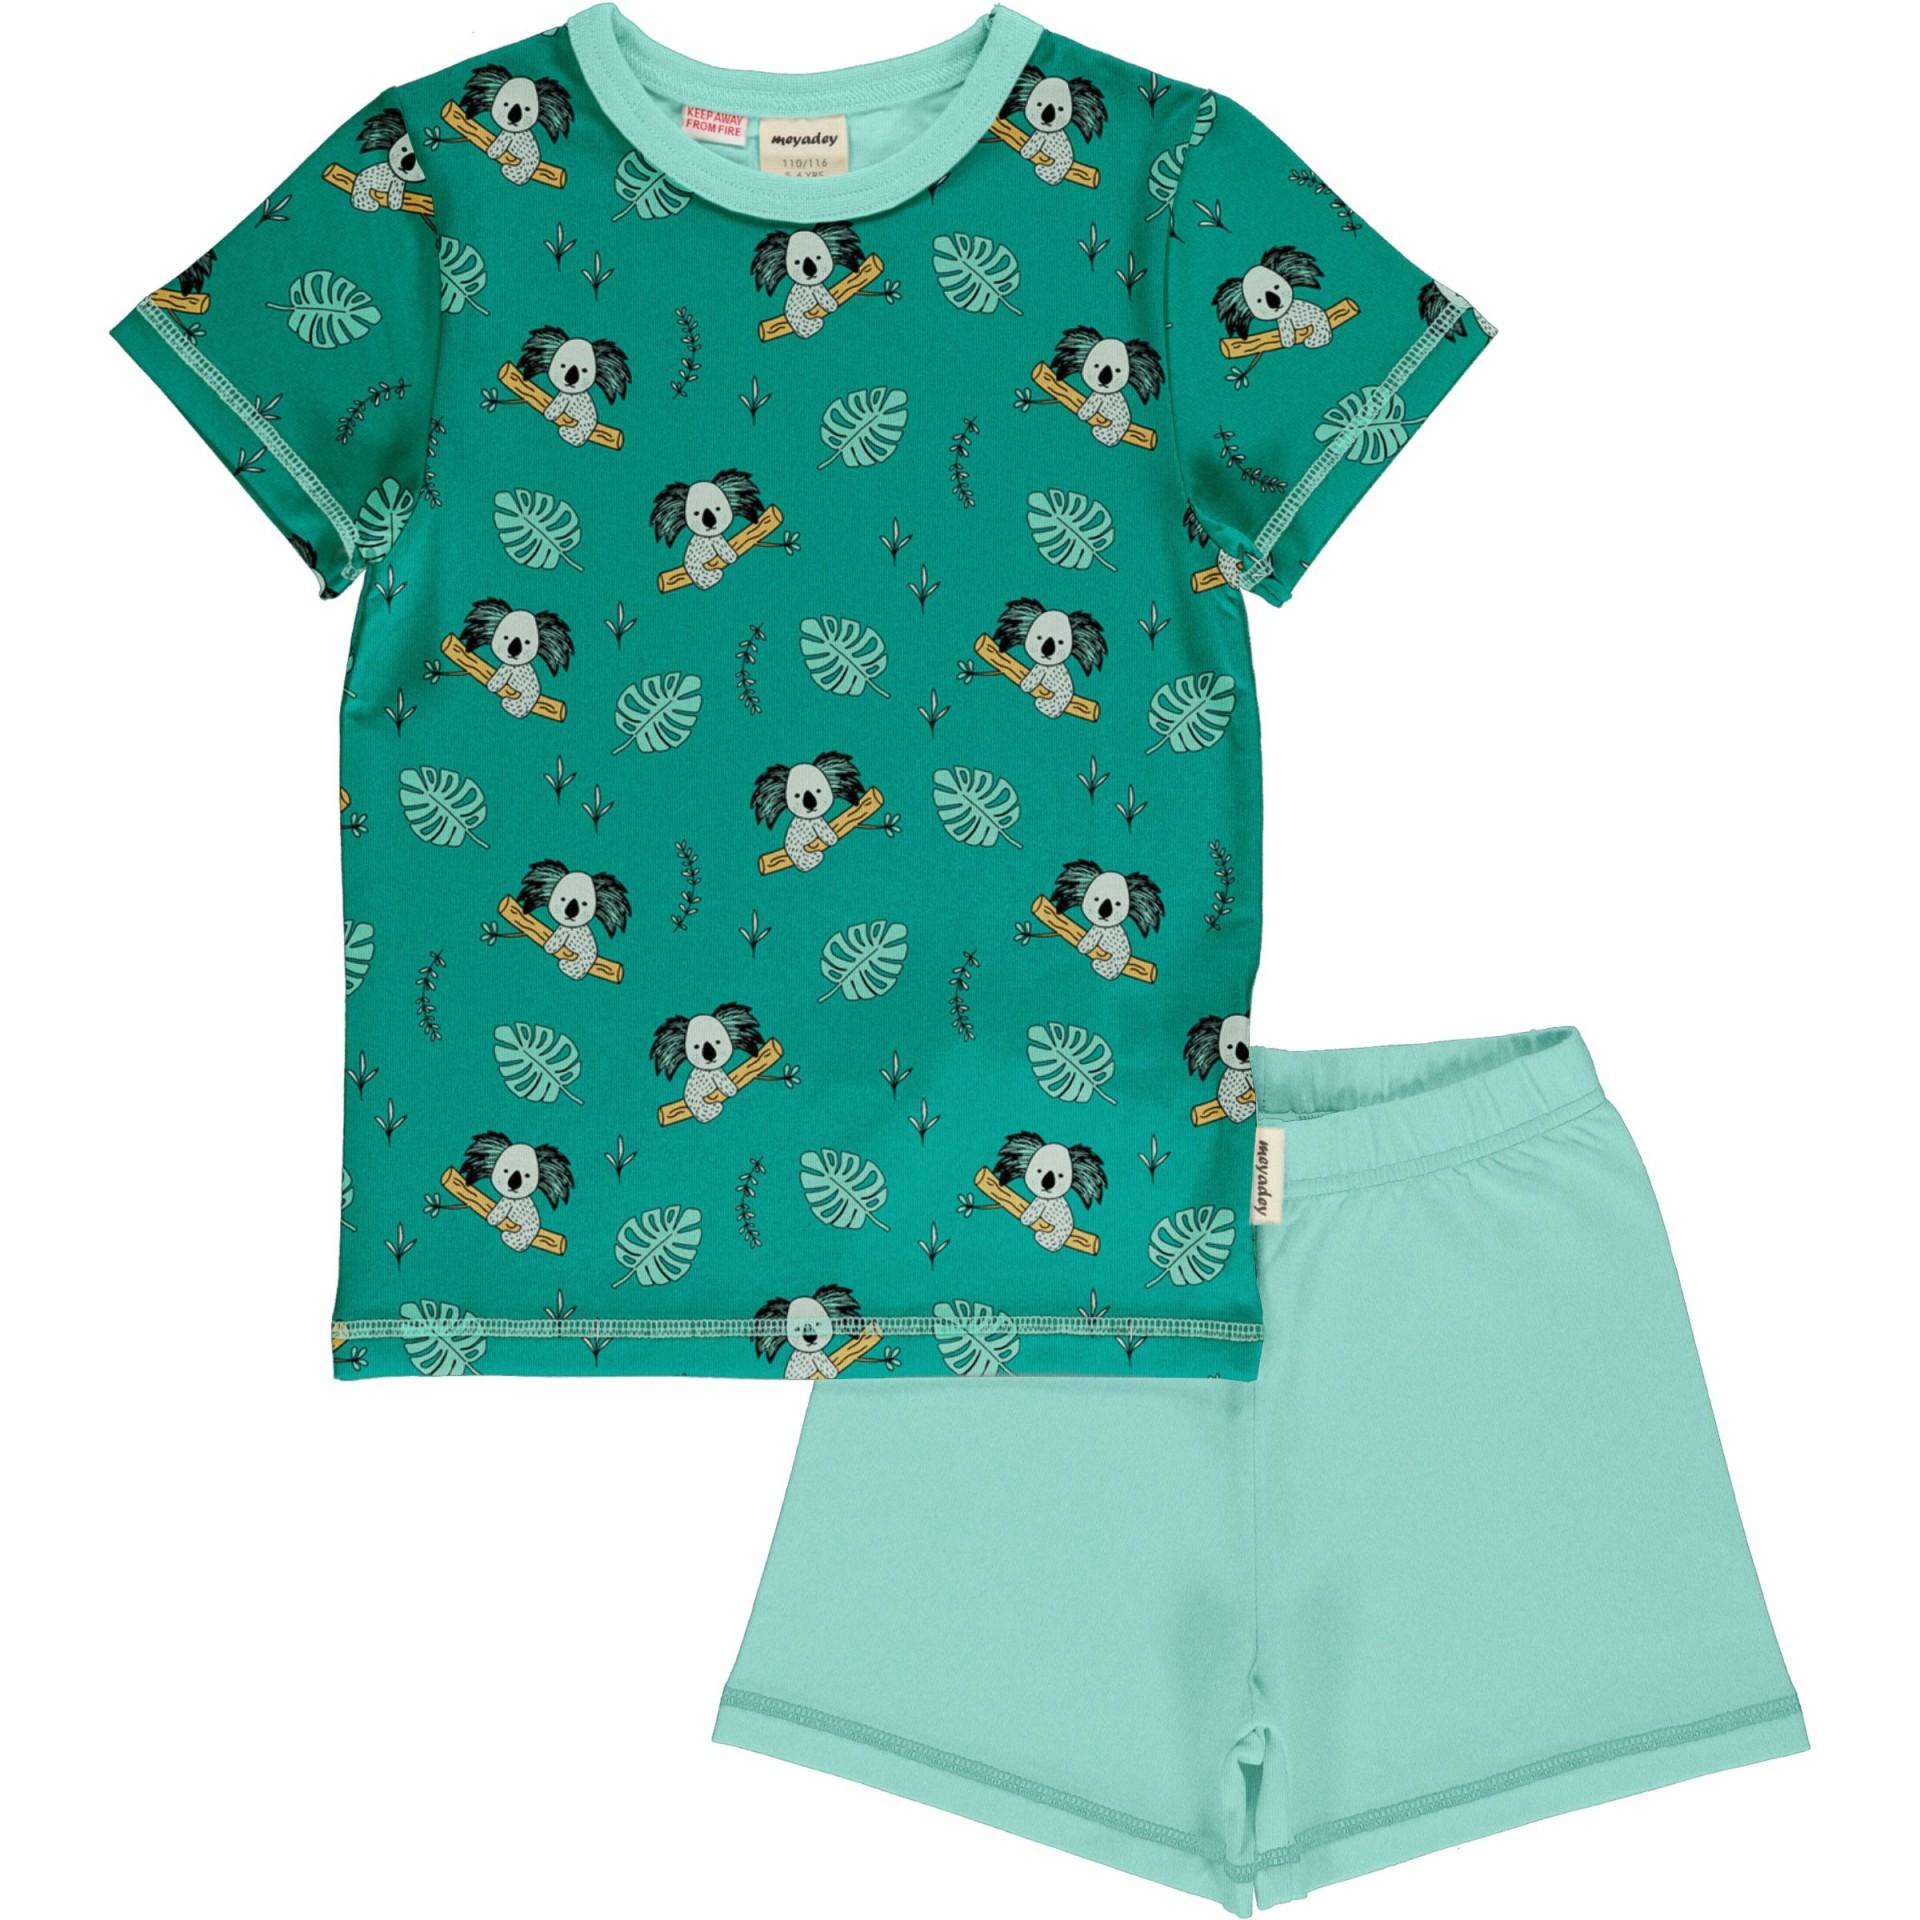 Pijama Koala Garden Meyaday (Tamanhos disponíveis 18-24m, 3-4a, 5-6a, 7-8a, 9-10a)